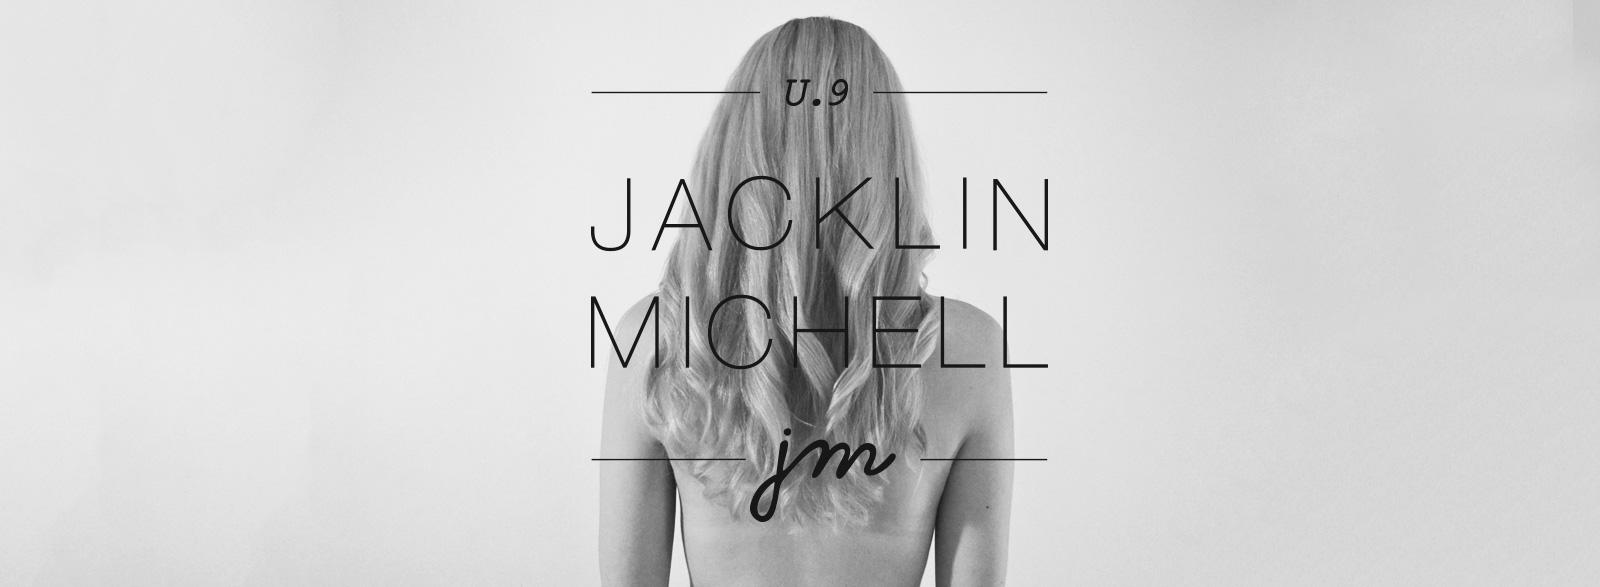 jacklinmichell